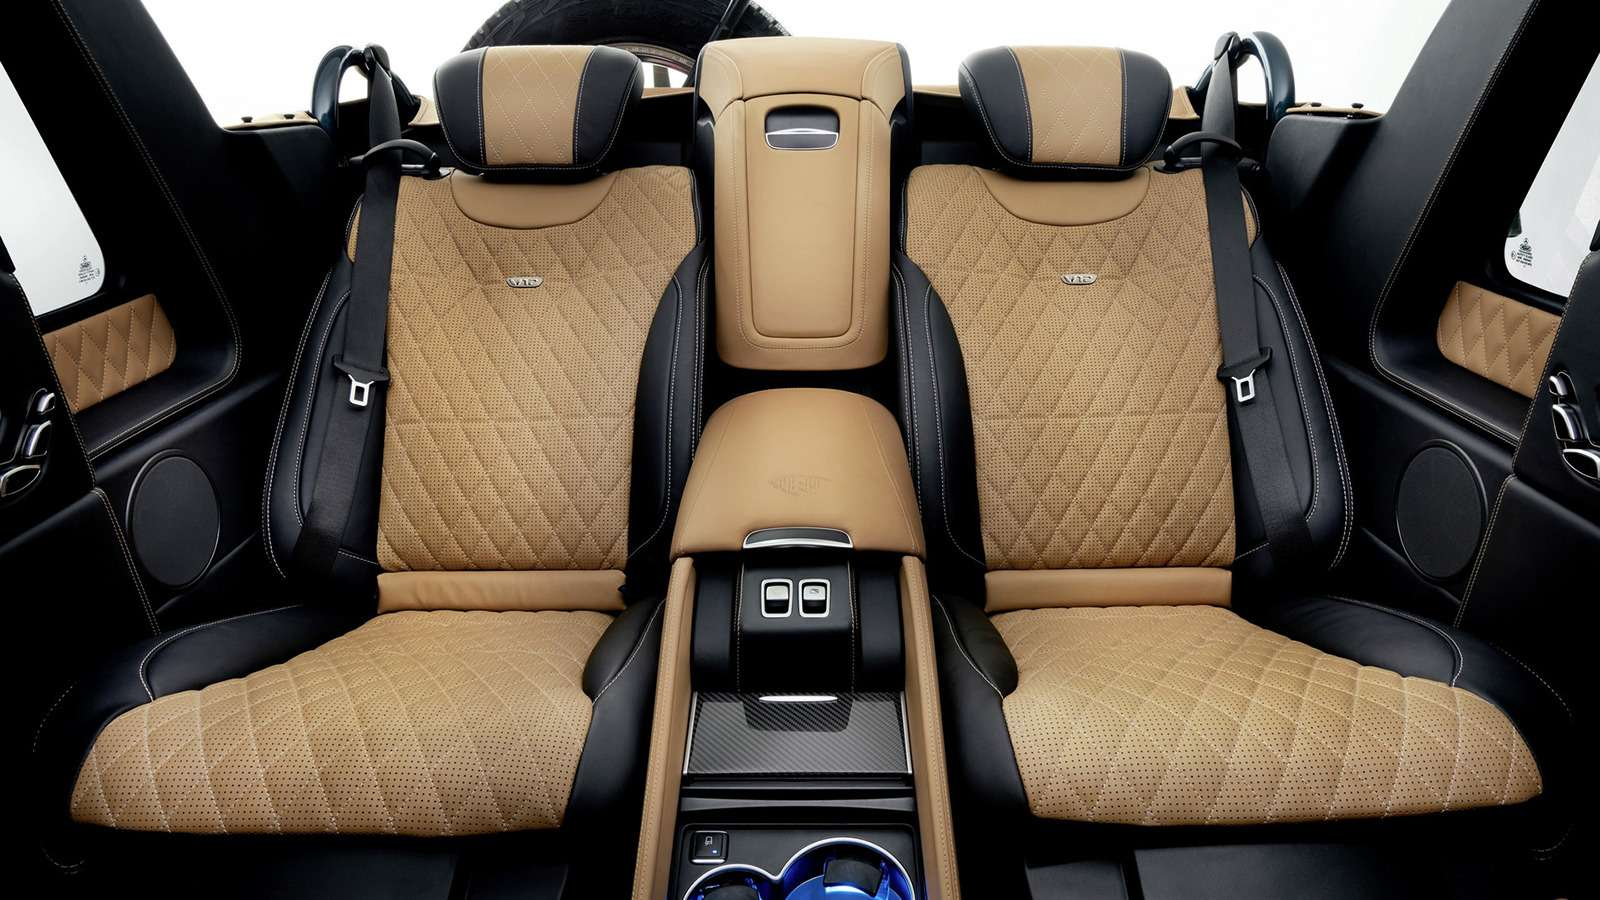 Внедорожник Maybach продали за1,2 миллиона евро. Икупил его не шейх!— фото 803357